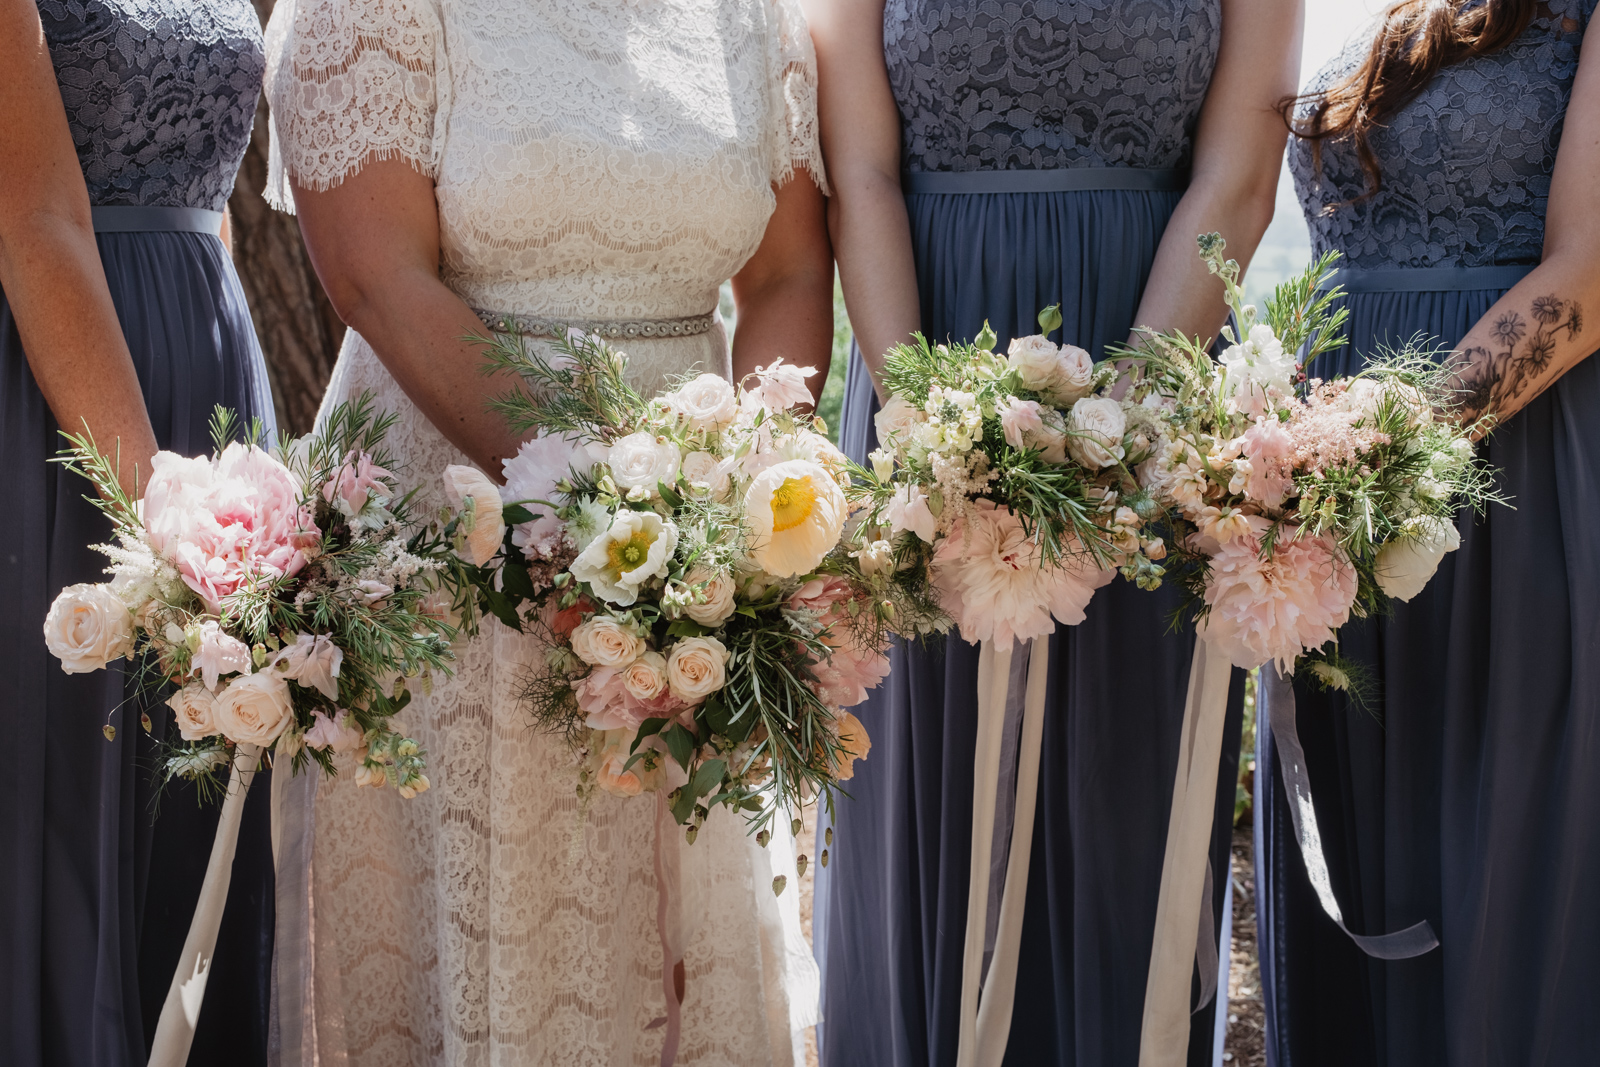 Bridgette-Dahlia-Blush-Silk-Lace-Wedding-Dress-Kate-Beaumont-Sheffield-Ivory-Fayre-5.jpg